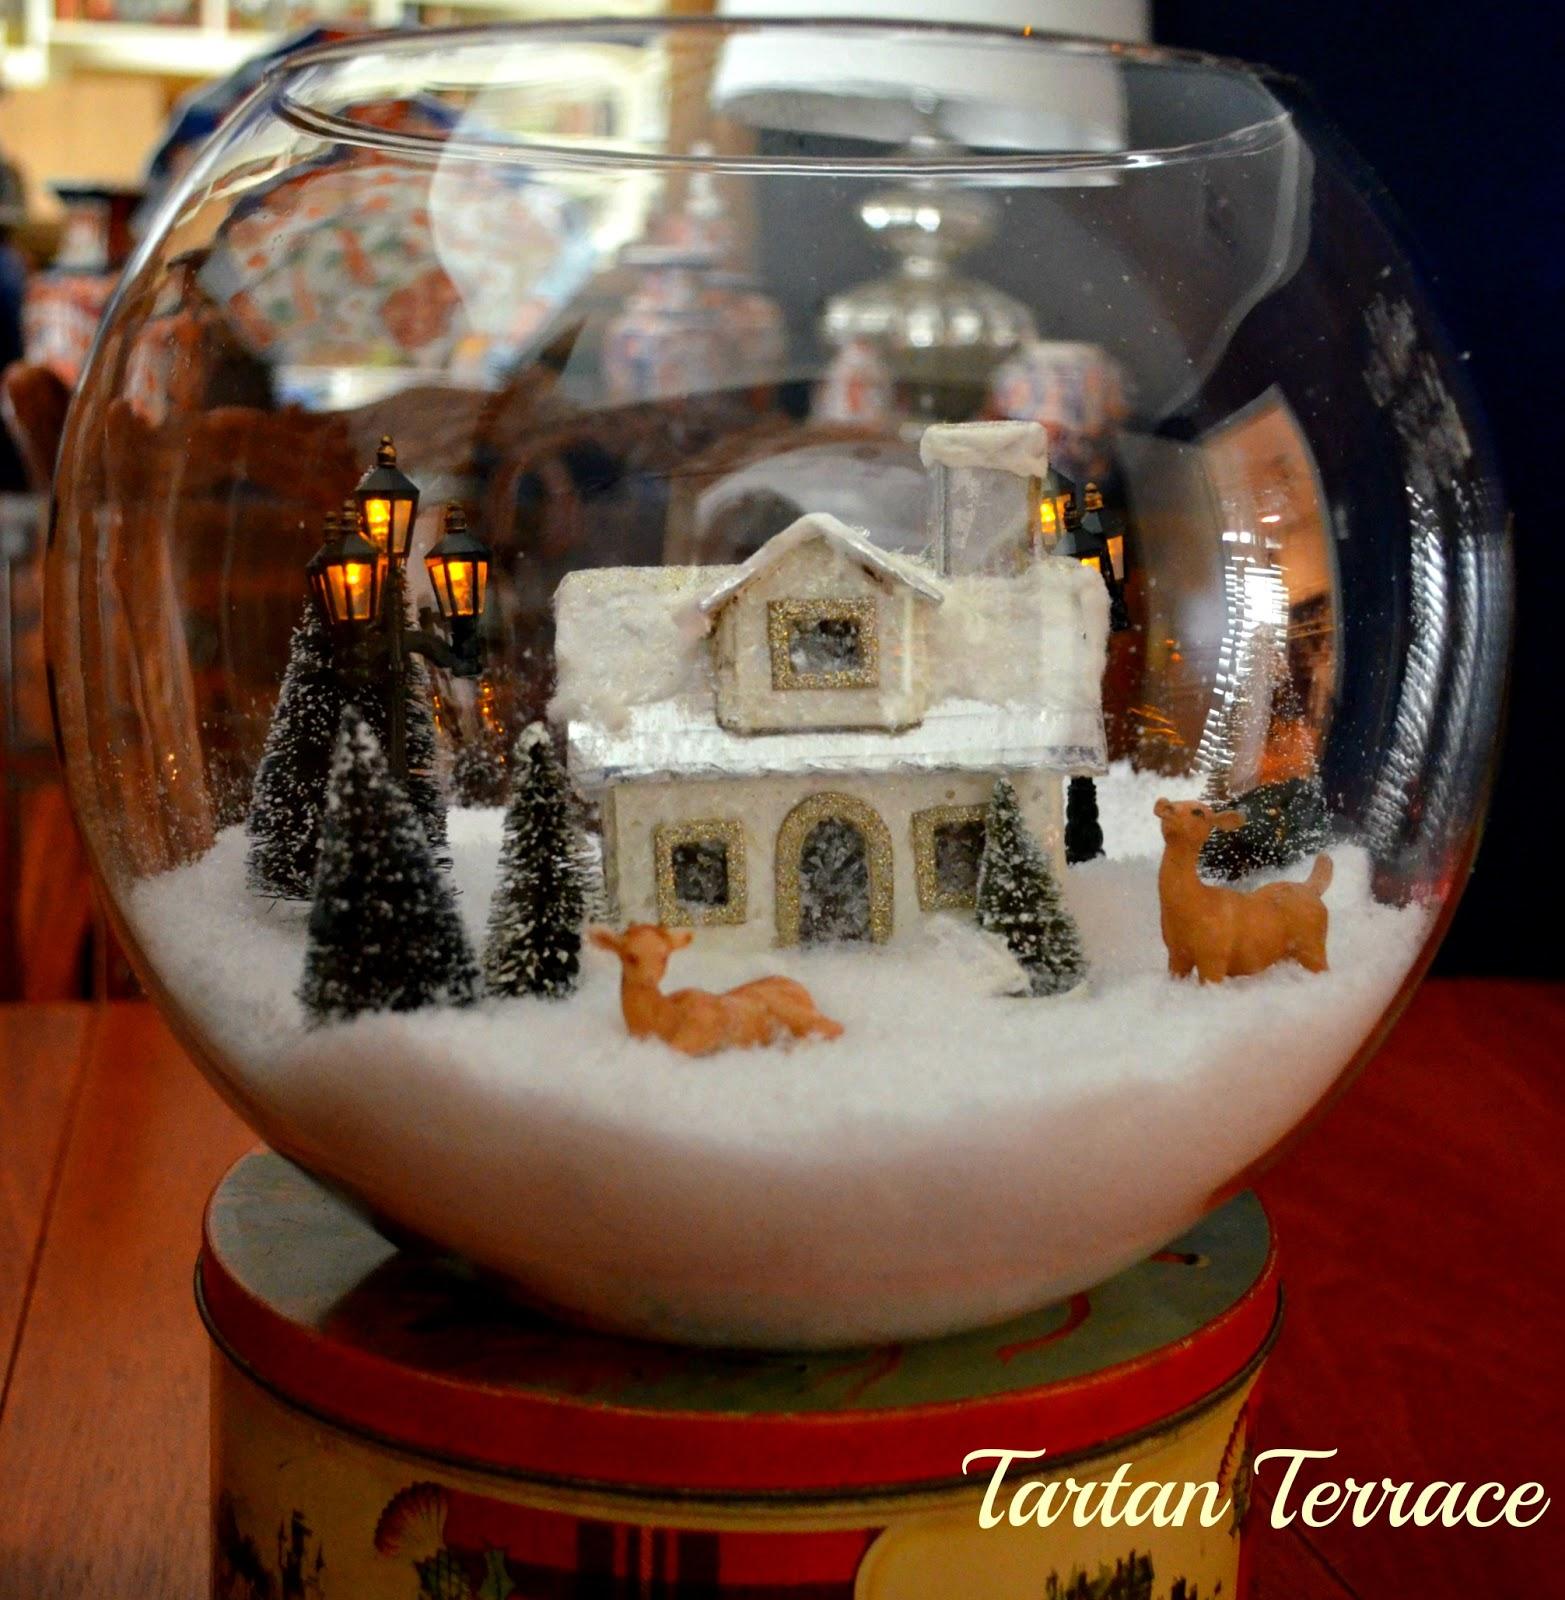 Tartanterrace Decorating For Christmas Lots Of Tartan In